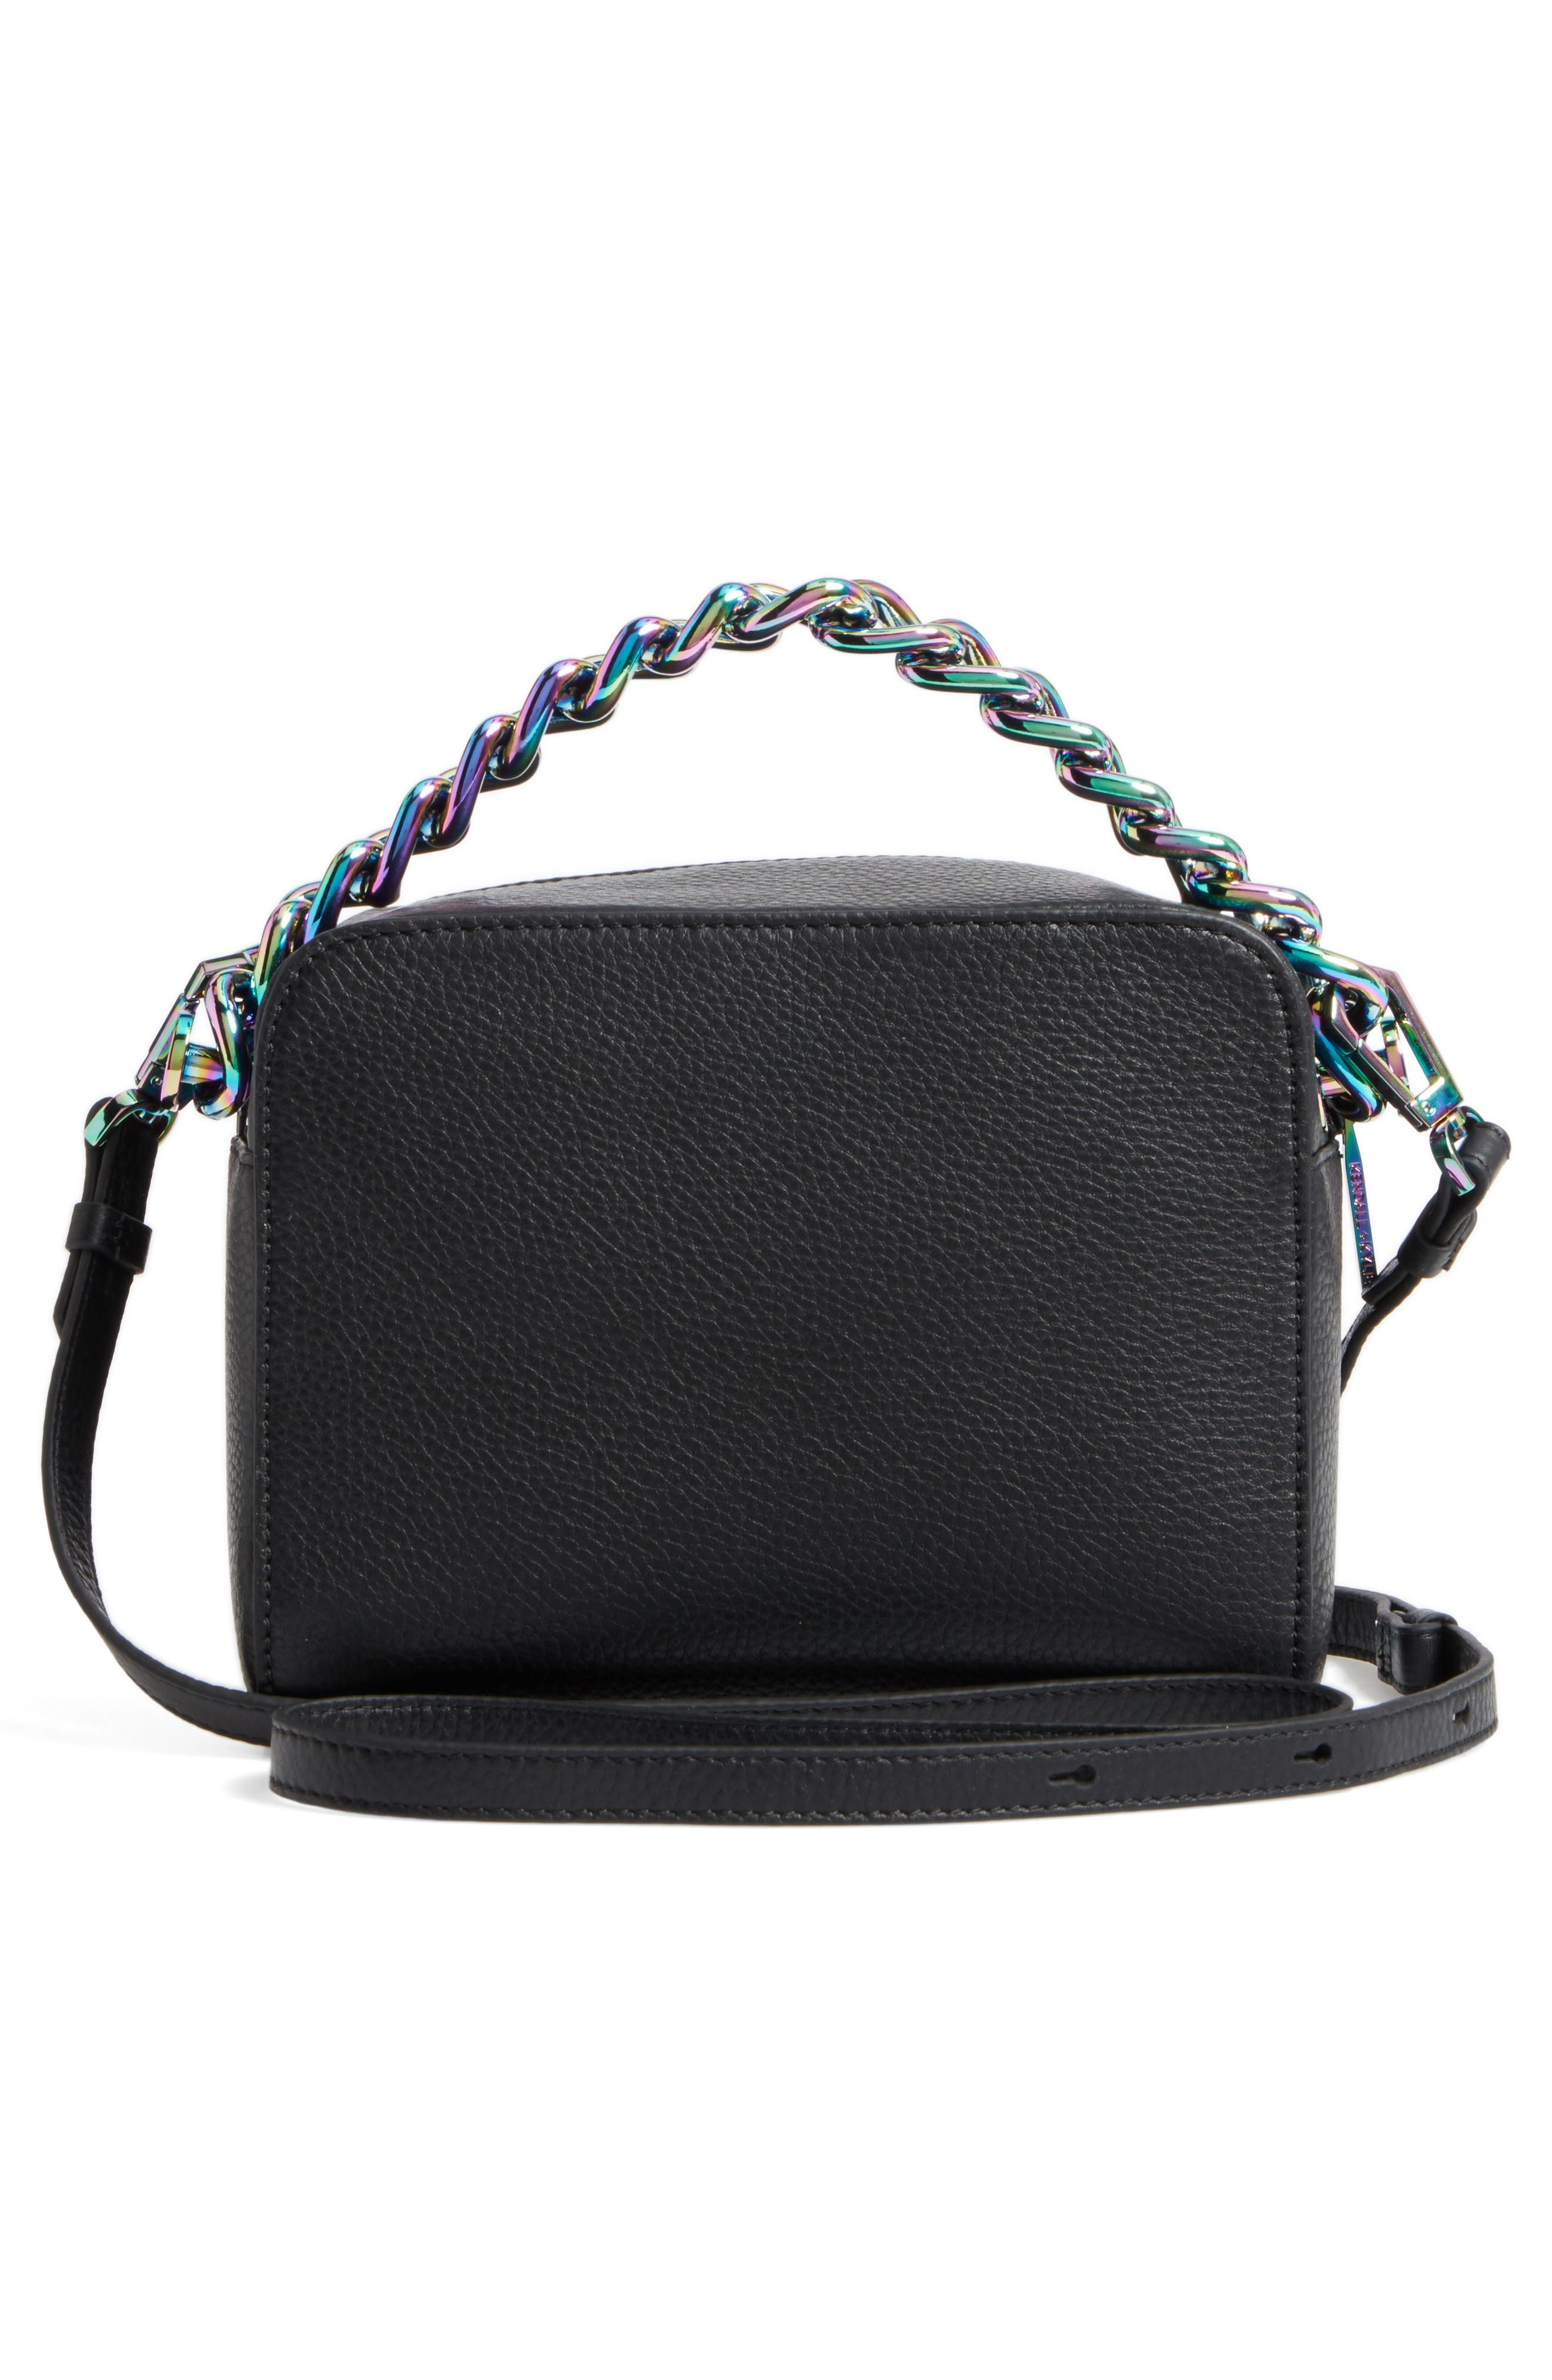 Lucy Lips Crossbody Bag,                             Alternate thumbnail 2, color,                             Black